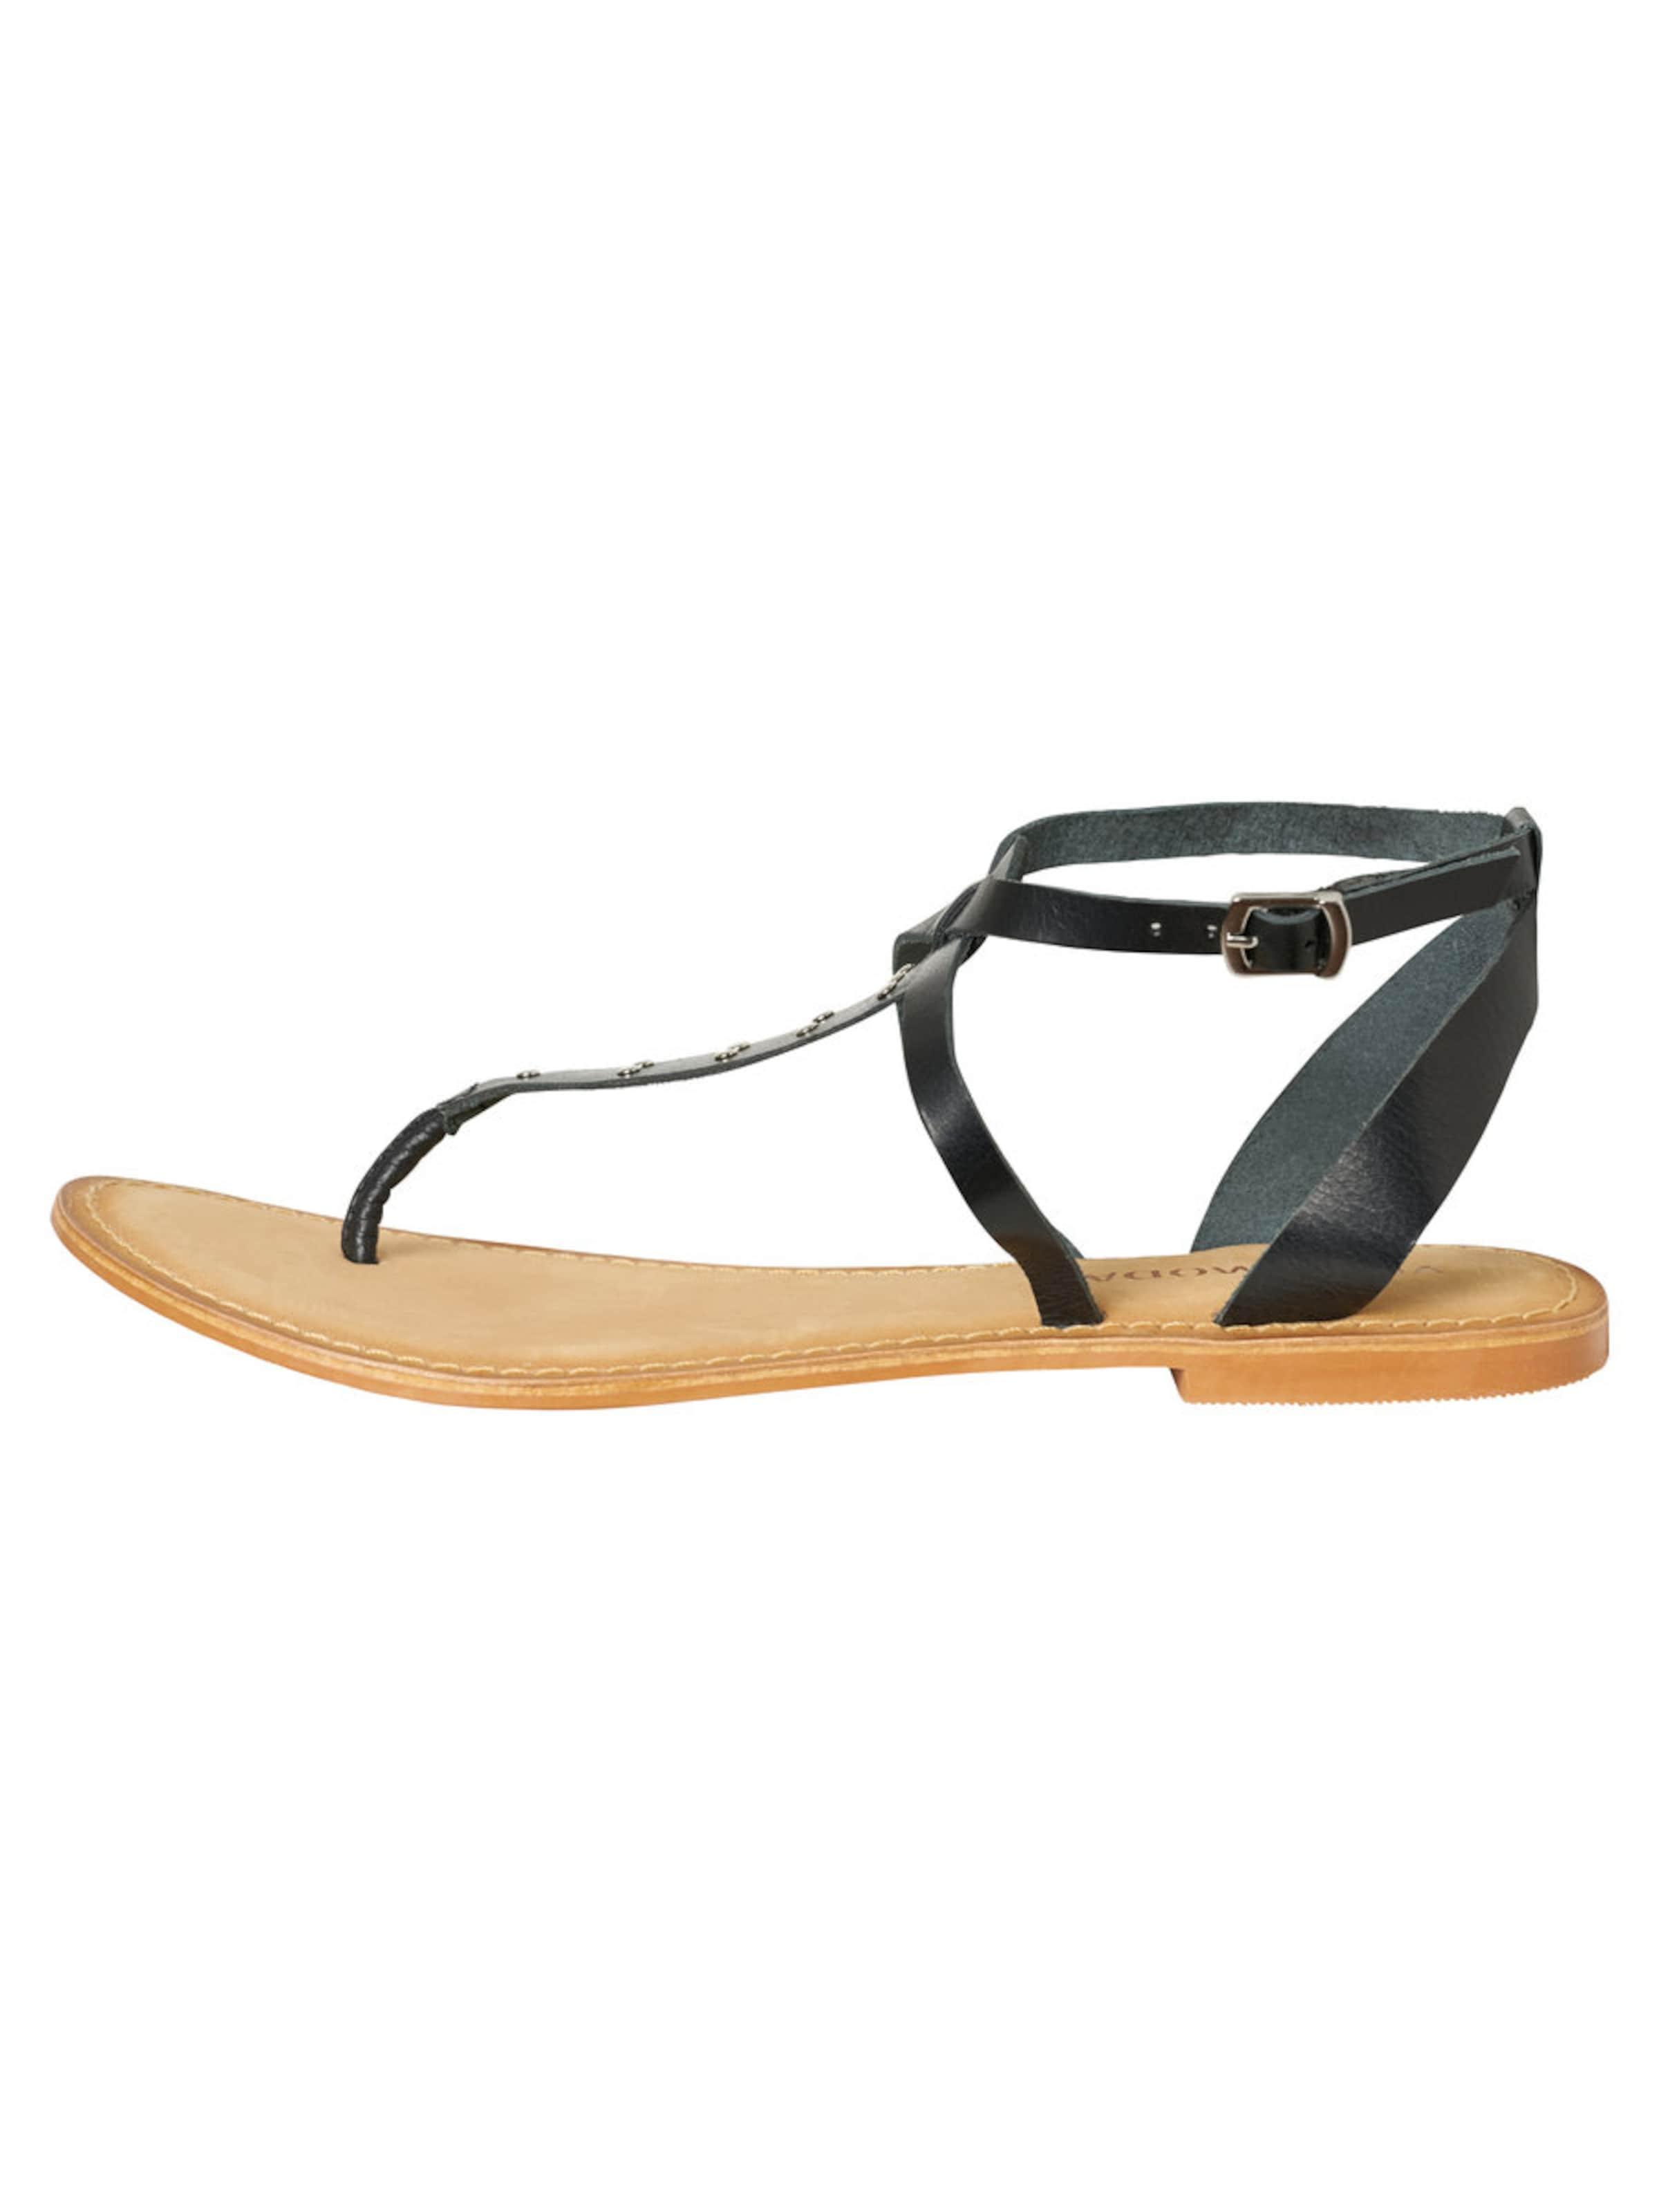 VERO MODA Lederriemen Sandalen Verschleißfeste billige Schuhe